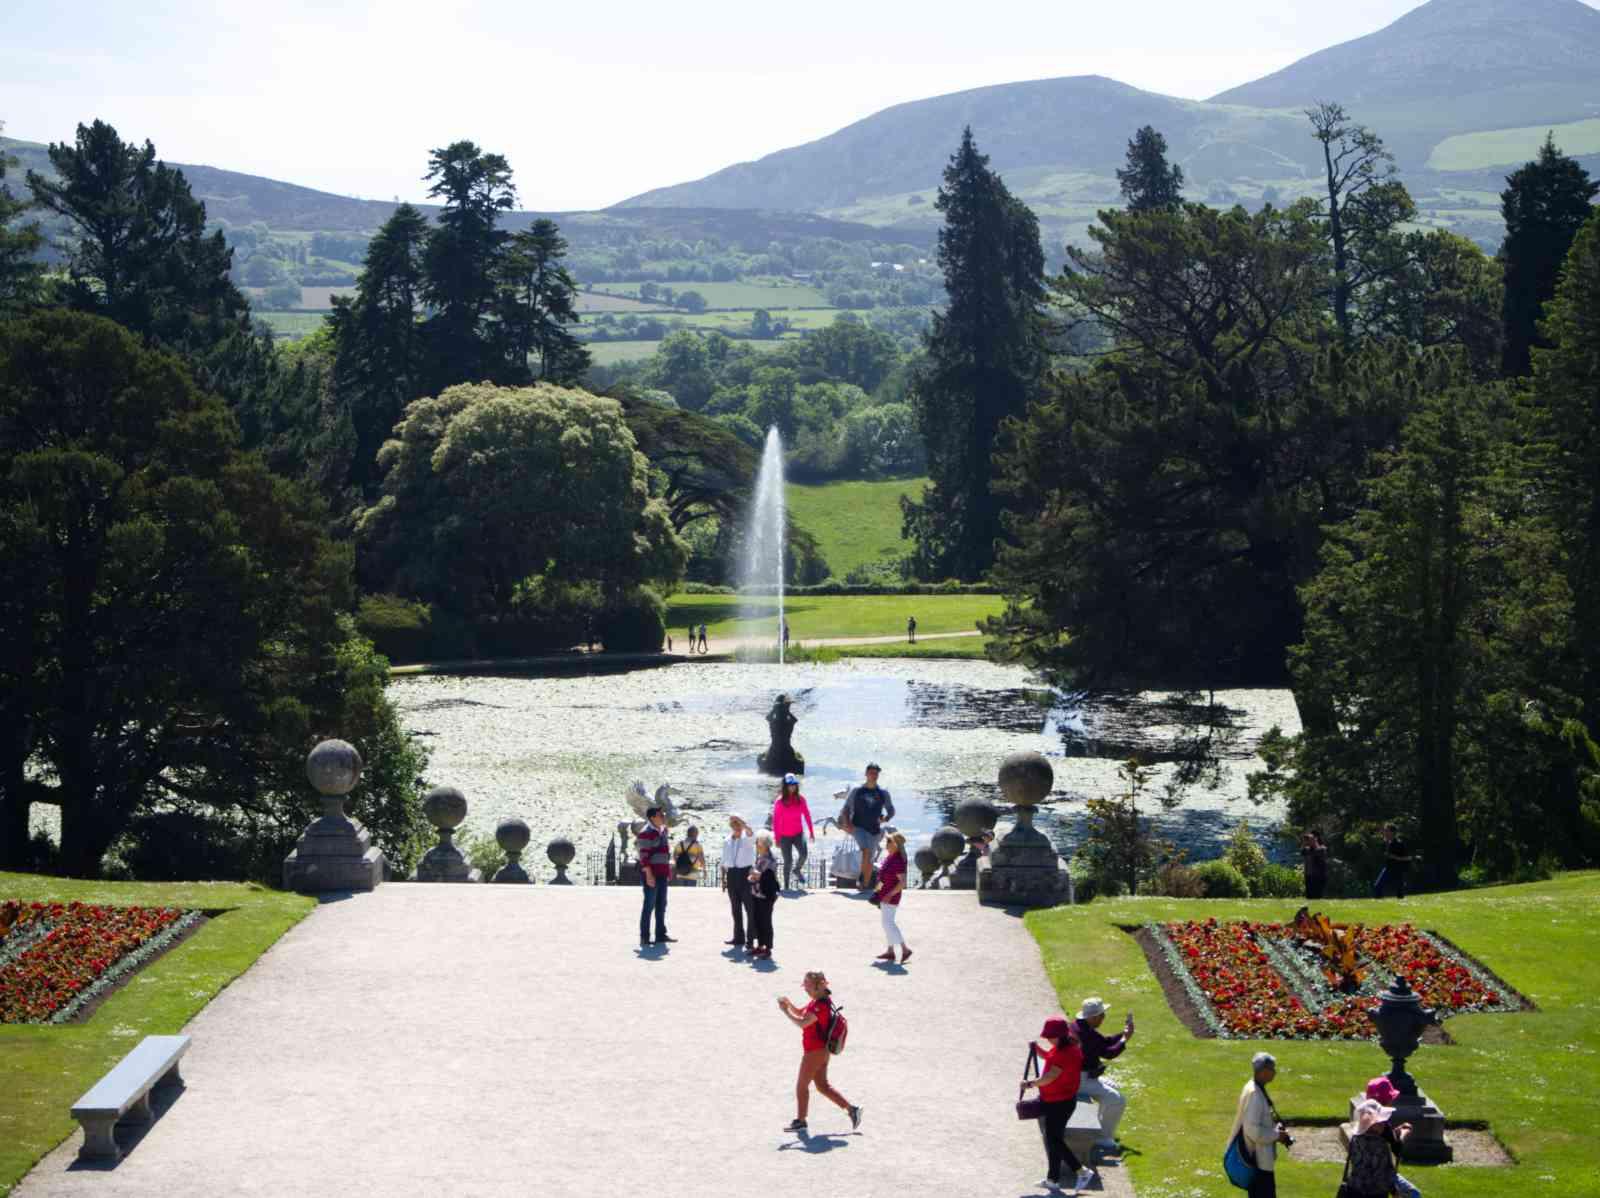 Powerscourt Gardens - Blick auf den Triton-Lake